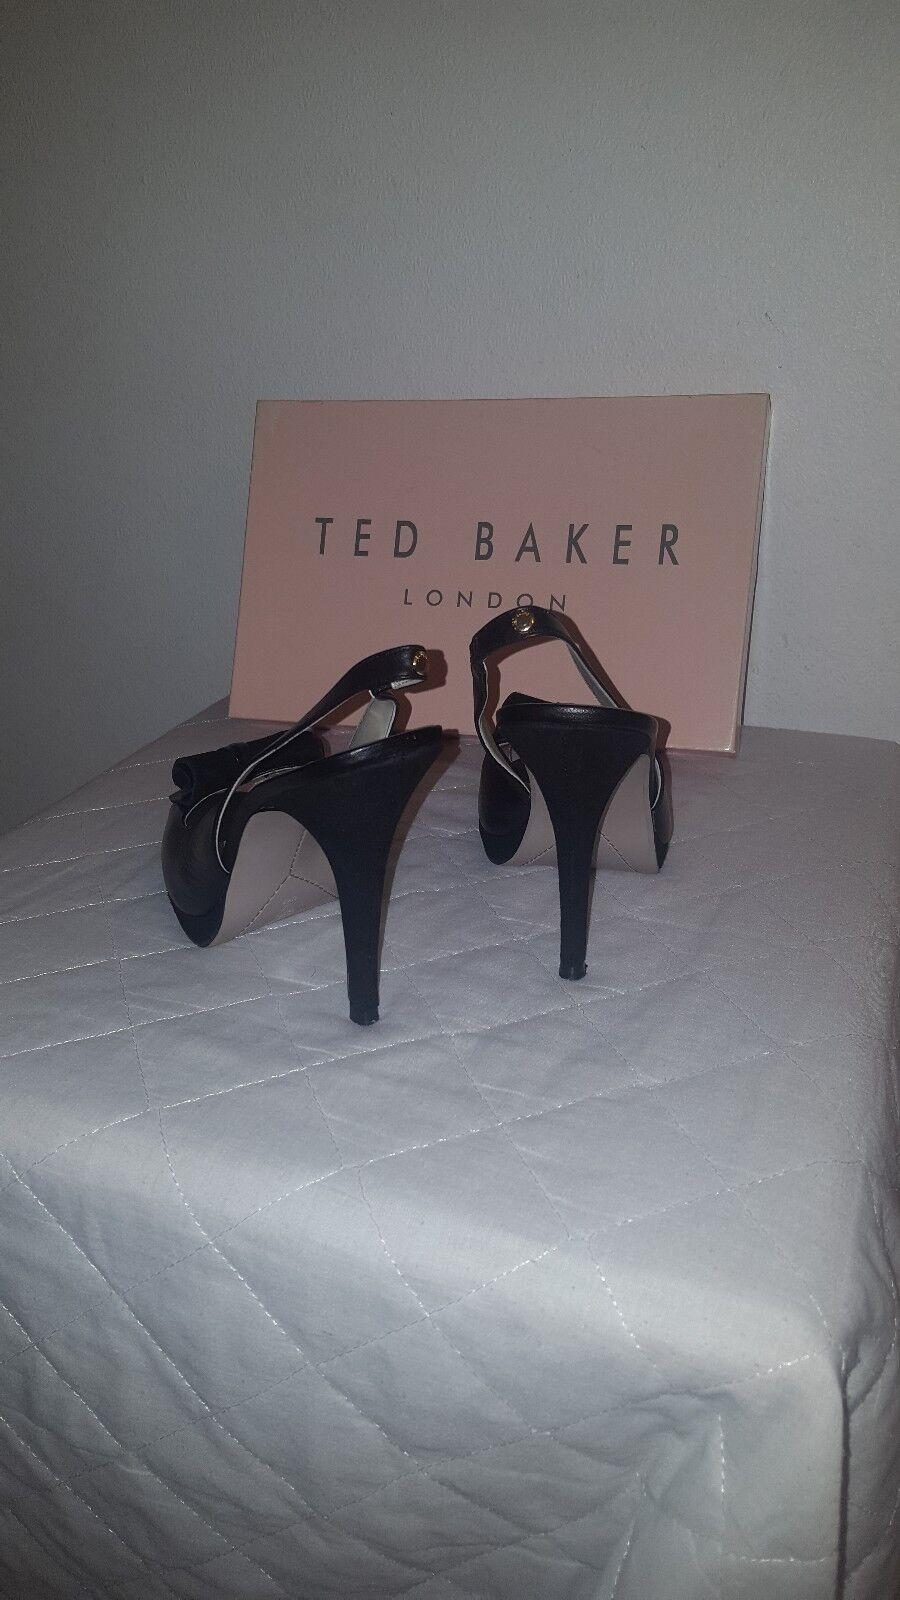 Black leather Ted Baker peep toe sling back 5inch heel size 7 shoe